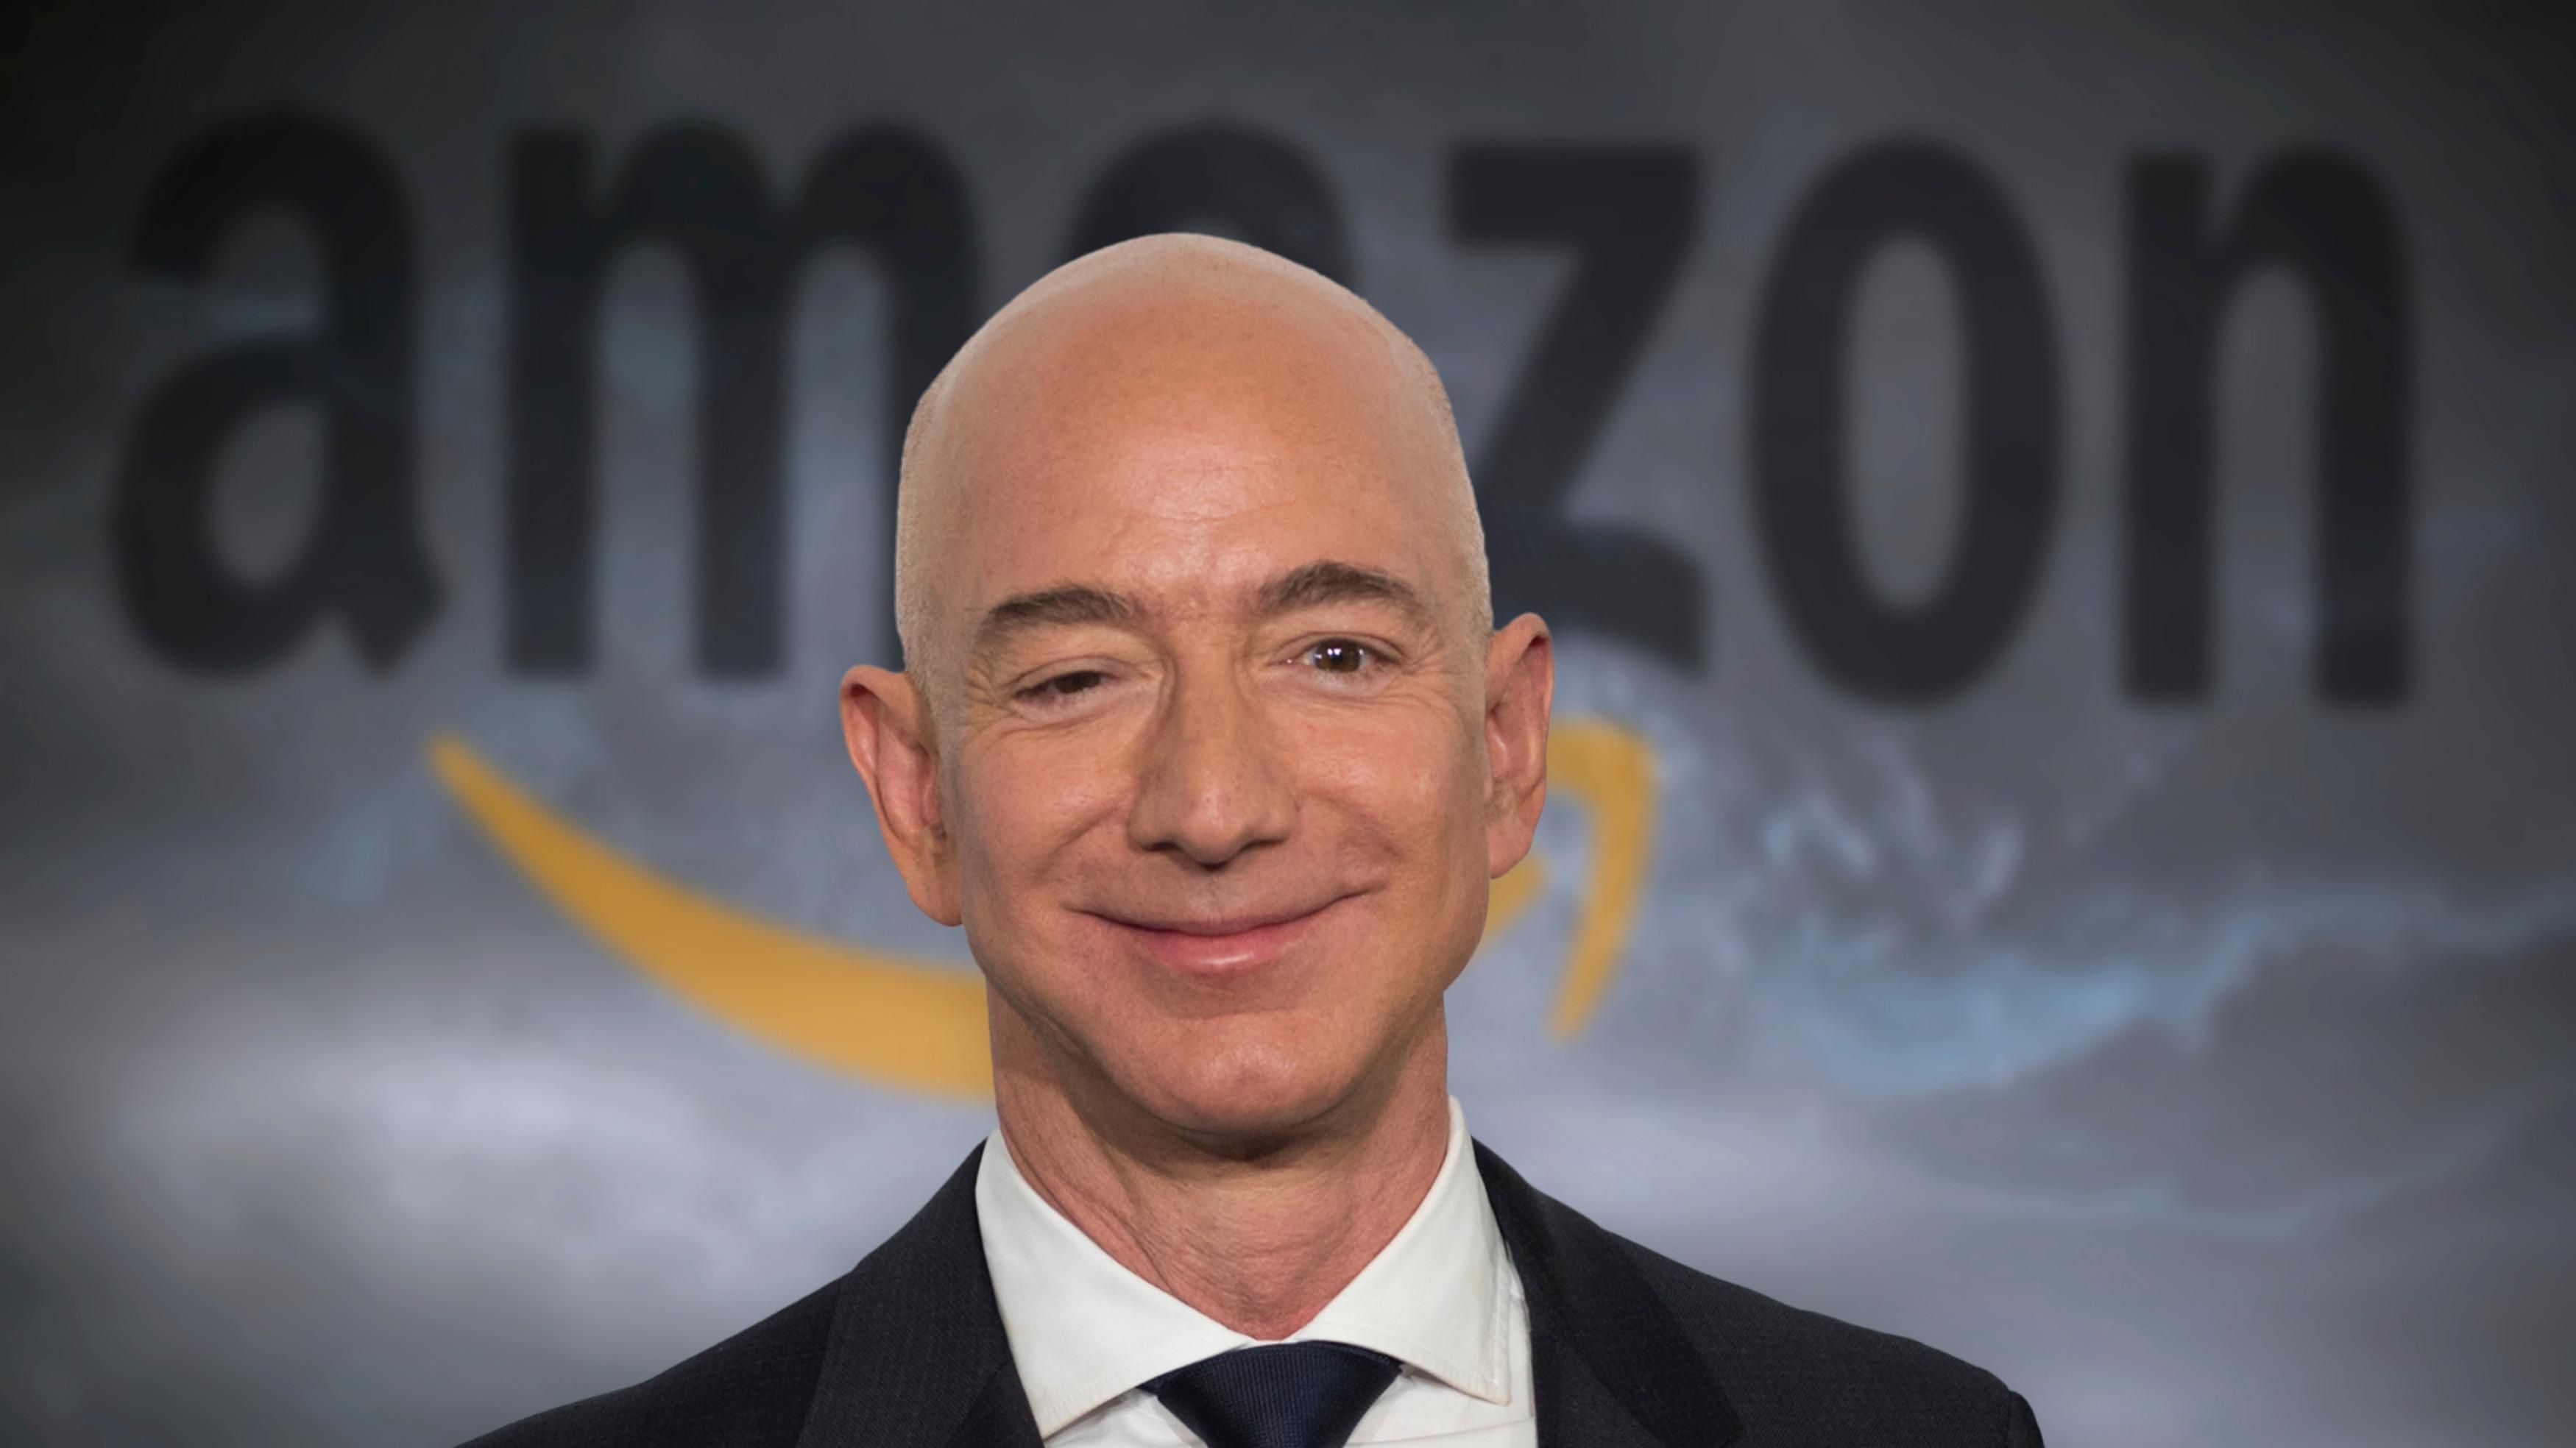 The Jeff <b>Bezos</b> trait...